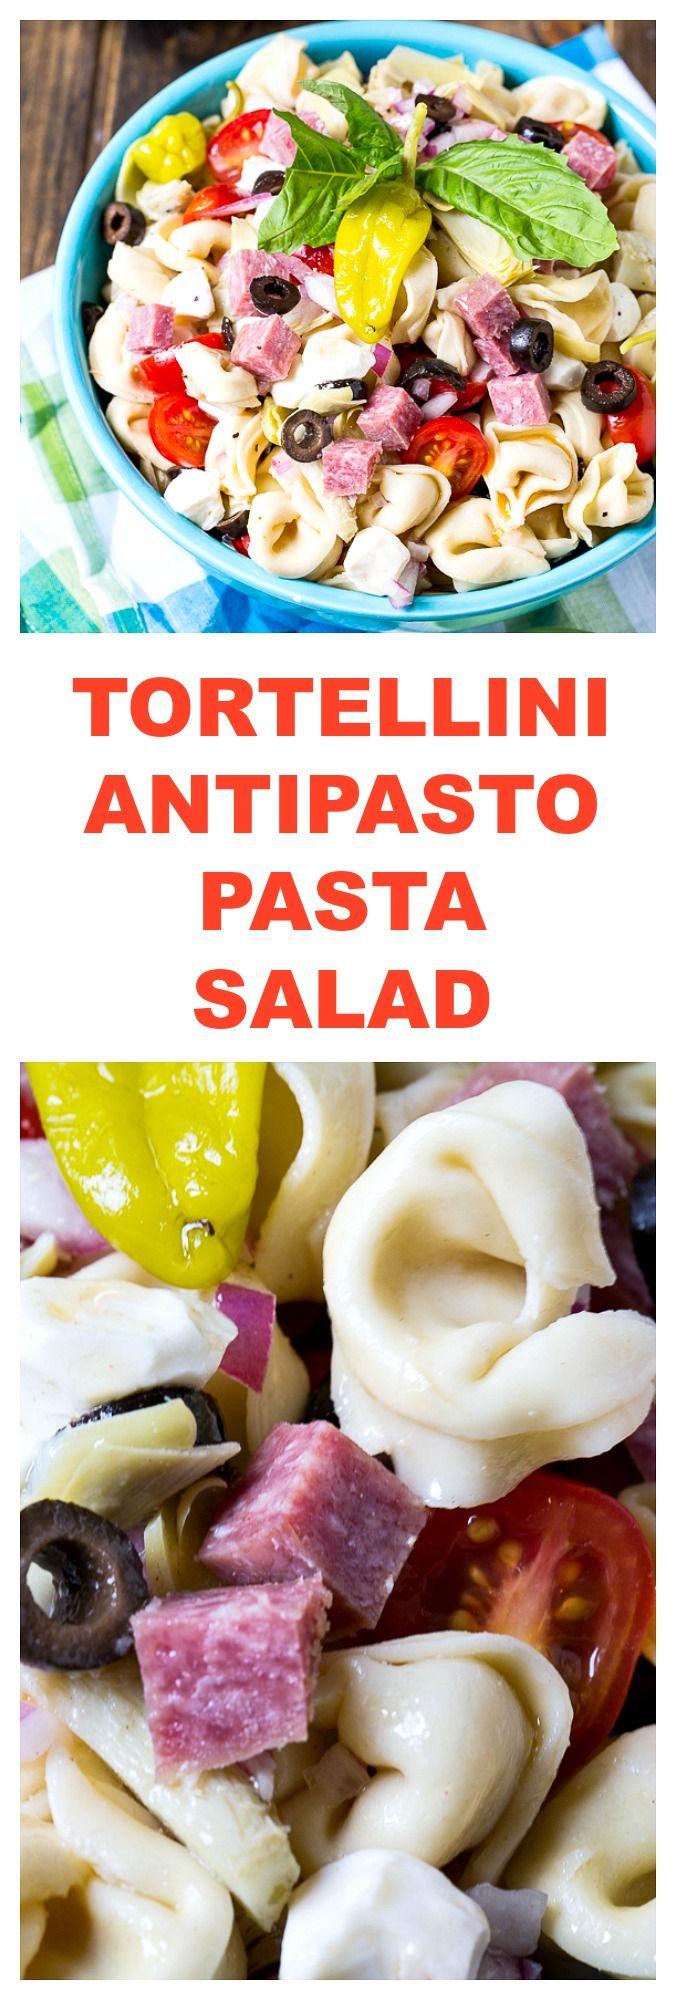 Cheese Tortellini Antipasto Pasta Salad with salami, mozzarella cheese, olives, and artichoke hearts.